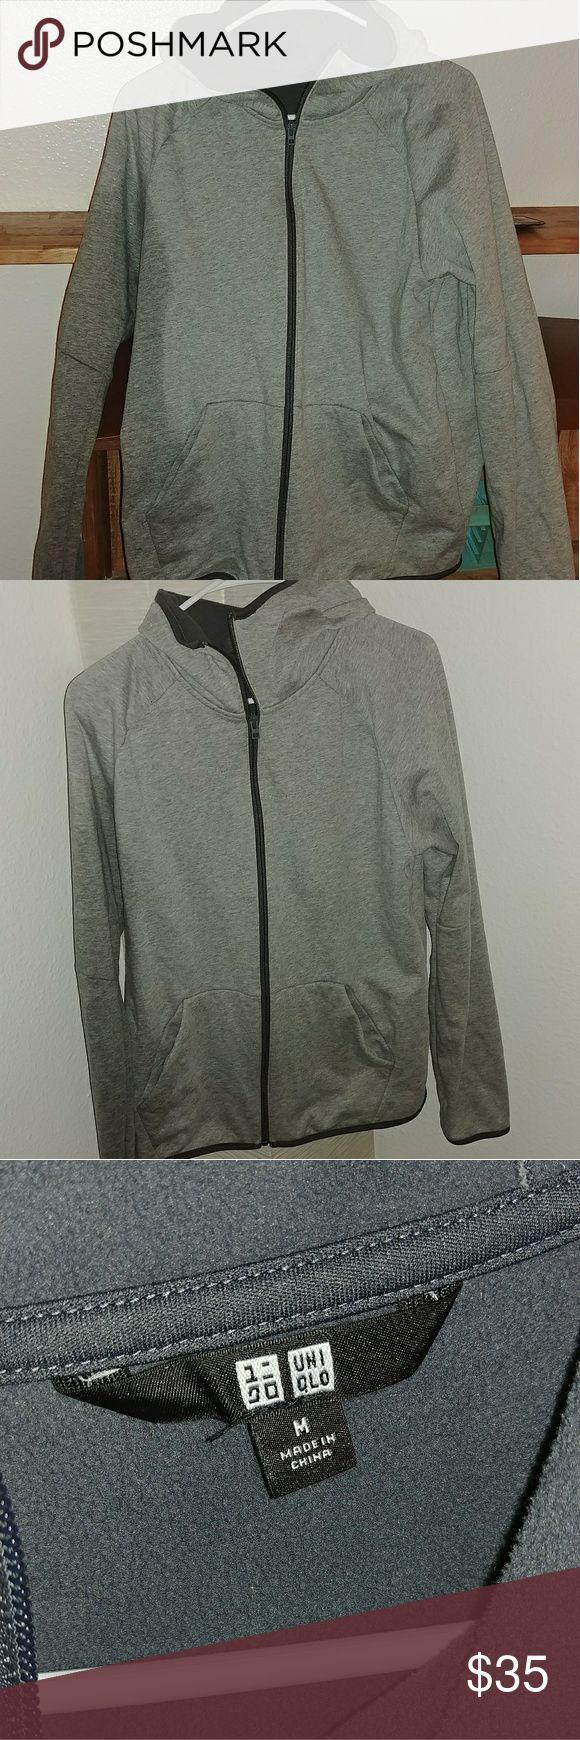 Uniqlo Mens Jacket Size M Great condition, lightweight jacket, fleece lined, comfy Uniqlo Jackets & Coats Lightweight & Shirt Jackets